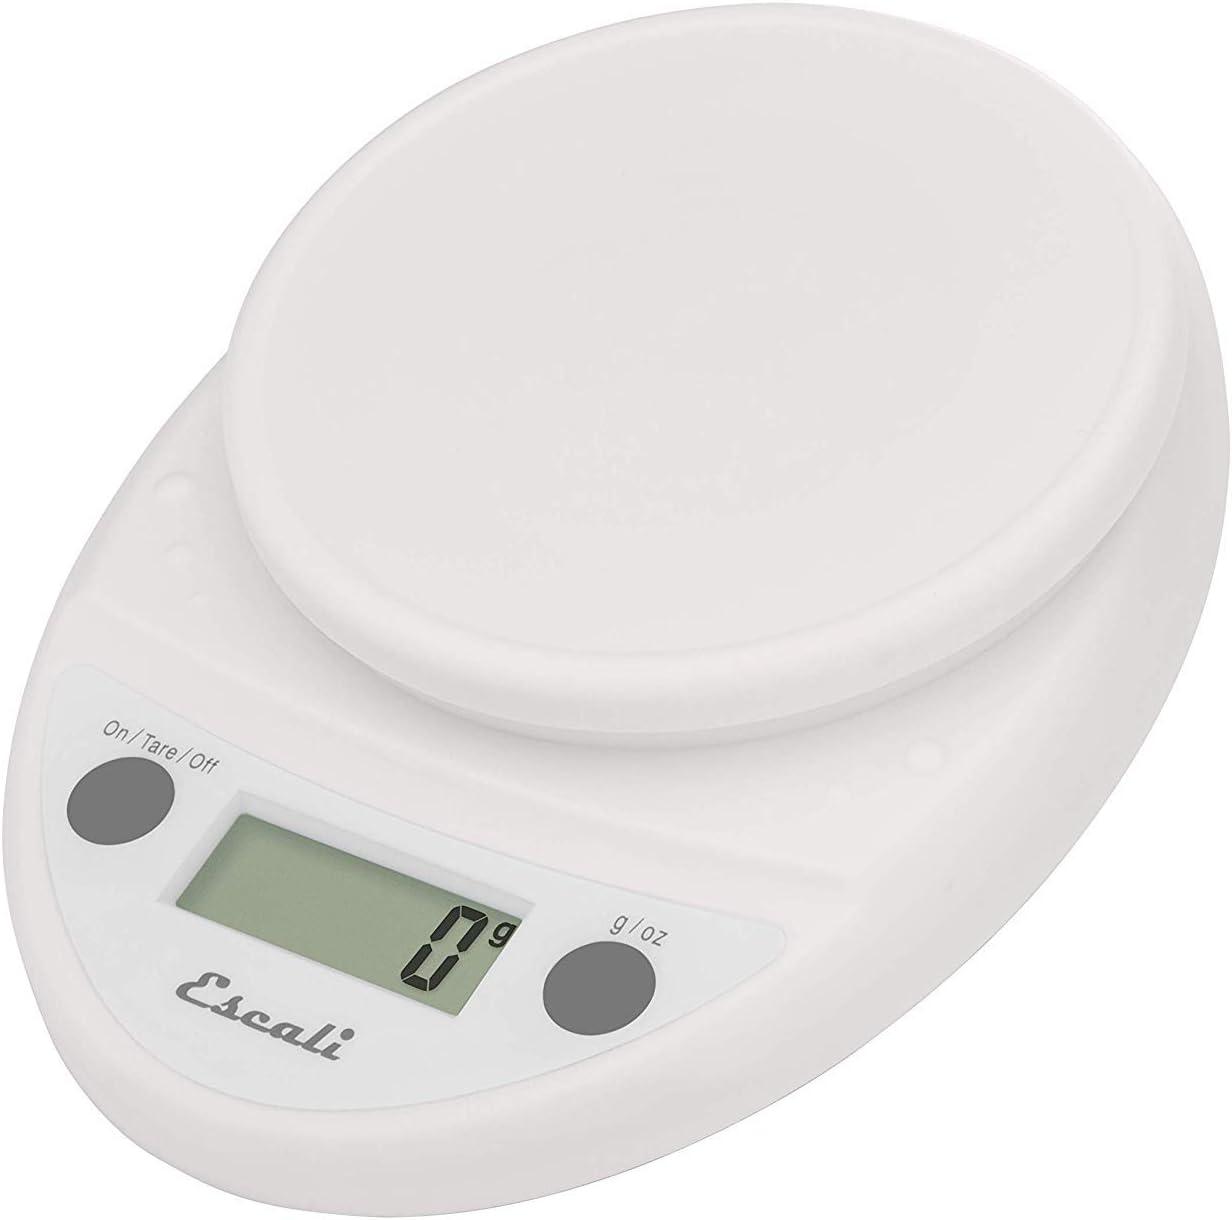 Amazon Com Escali Primo Lightweight Scale 8 5 X 6 X 1 5 Inches Soft White Digital Kitchen Scales Kitchen Dining